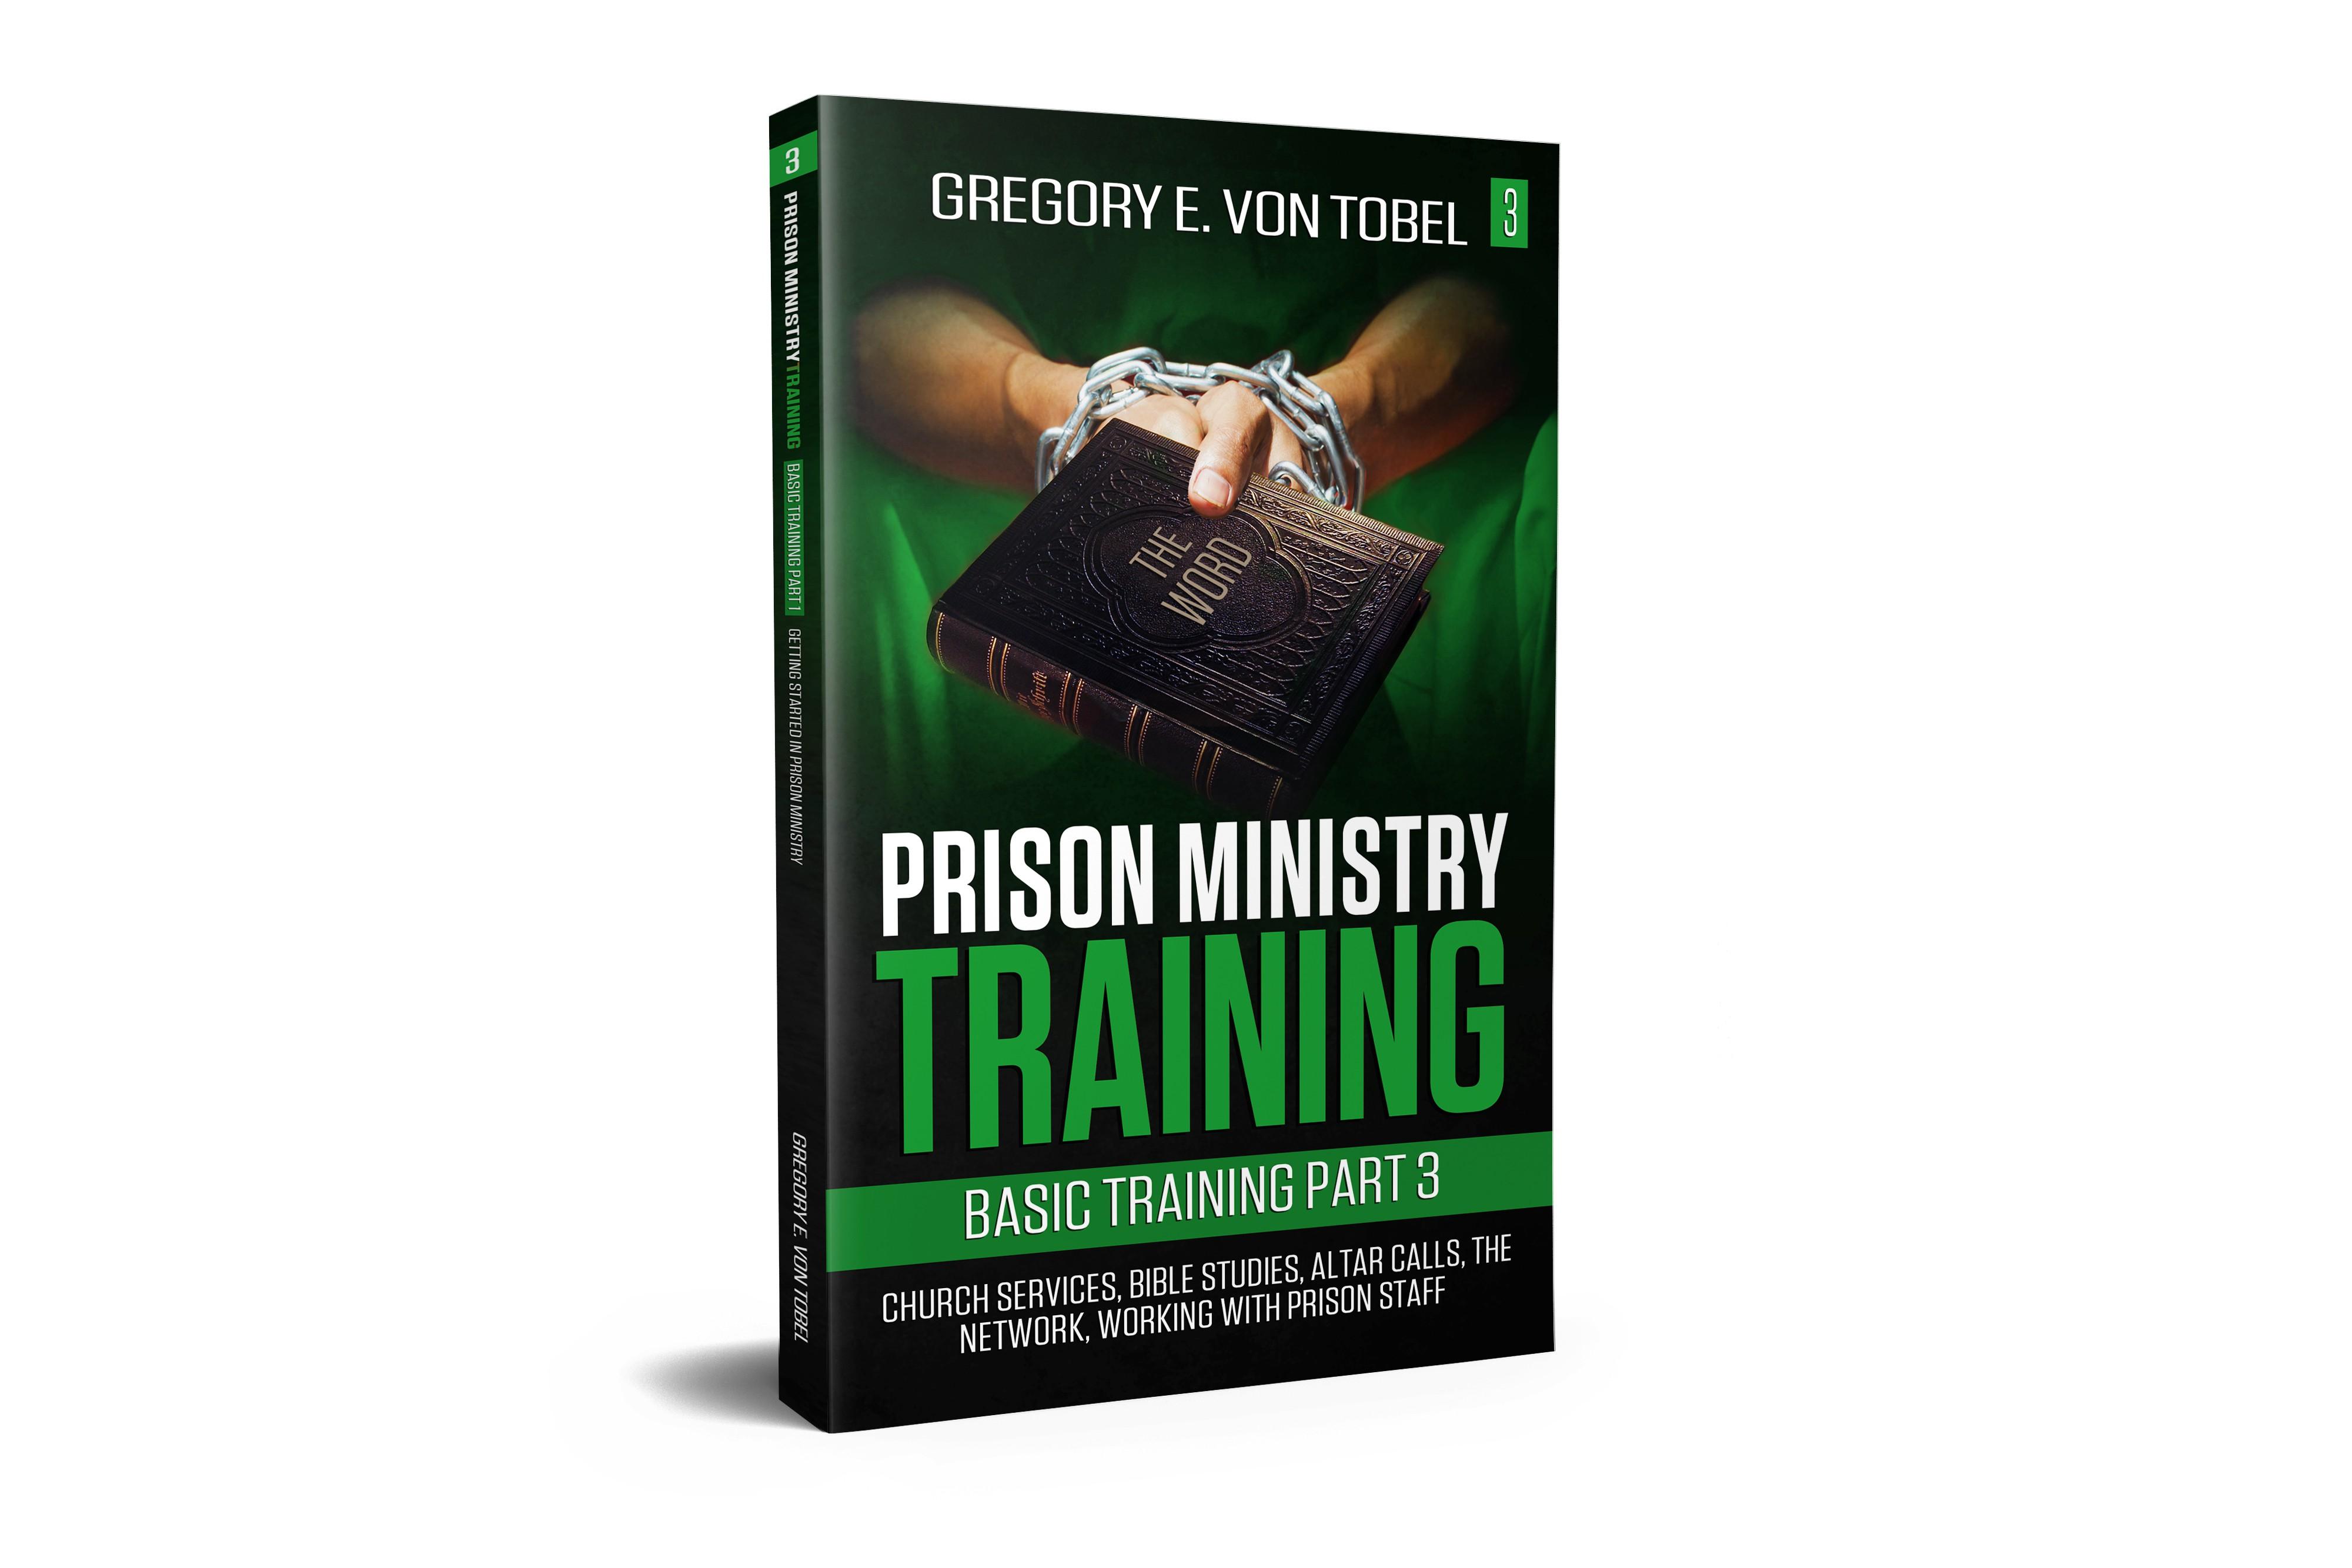 Prison ministry part 3